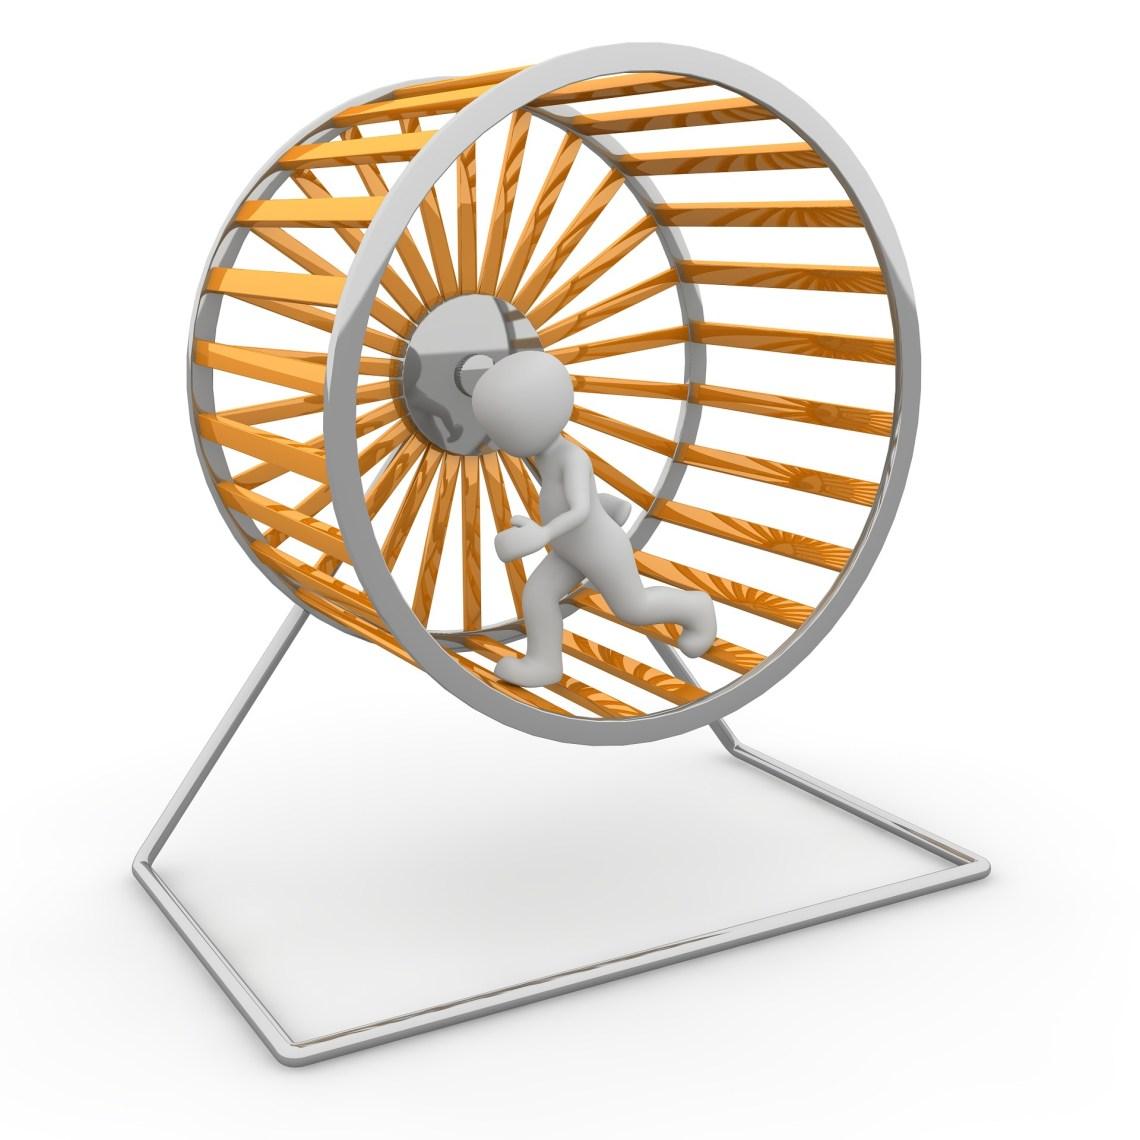 hamster-wheel-1014047_1920